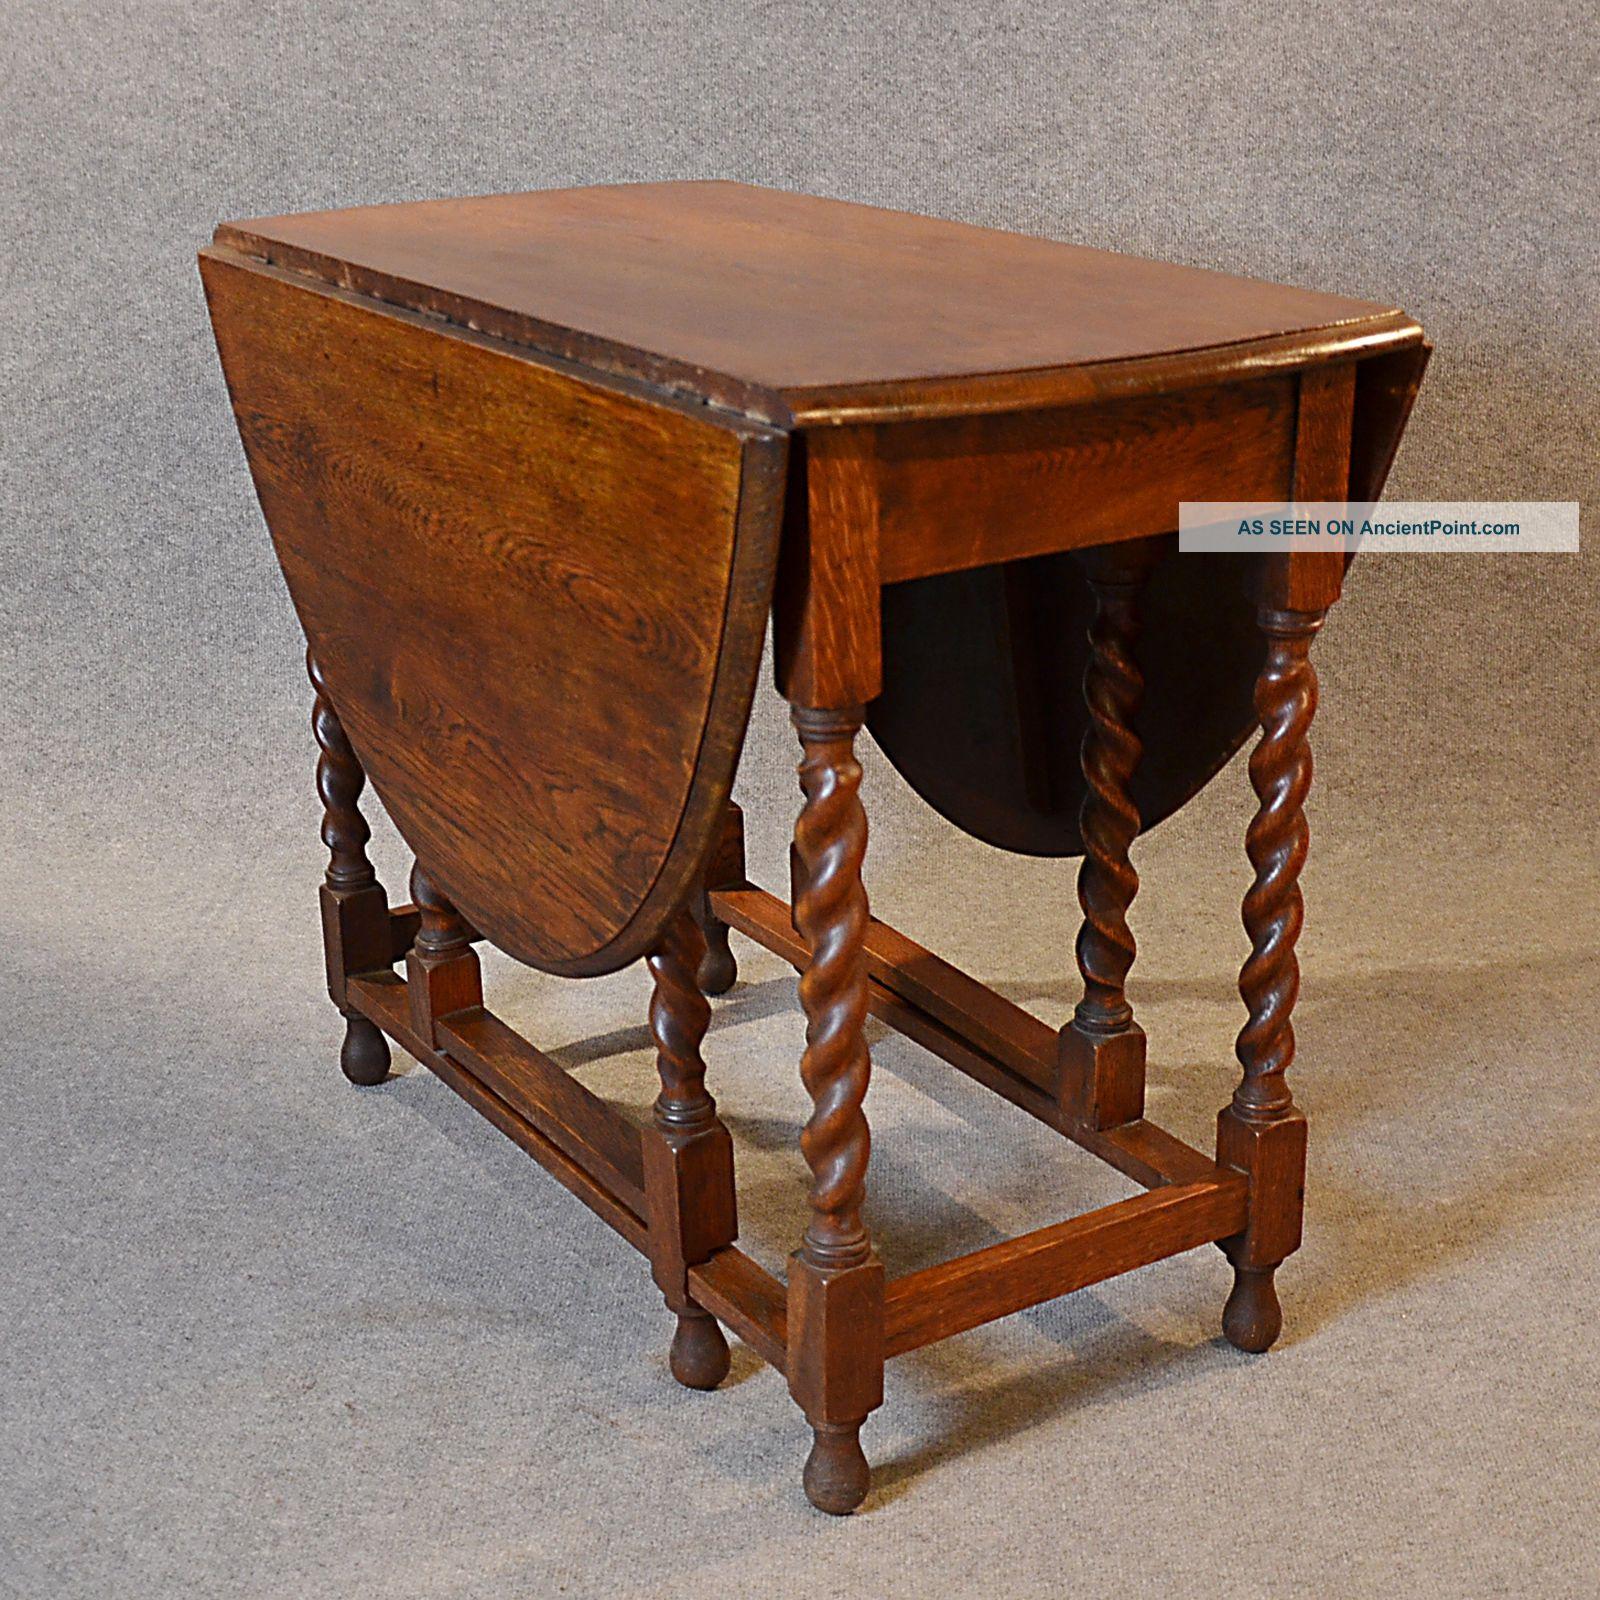 Magnificent Antique Gate Leg Dining Table 1600 x 1600 · 469 kB · jpeg